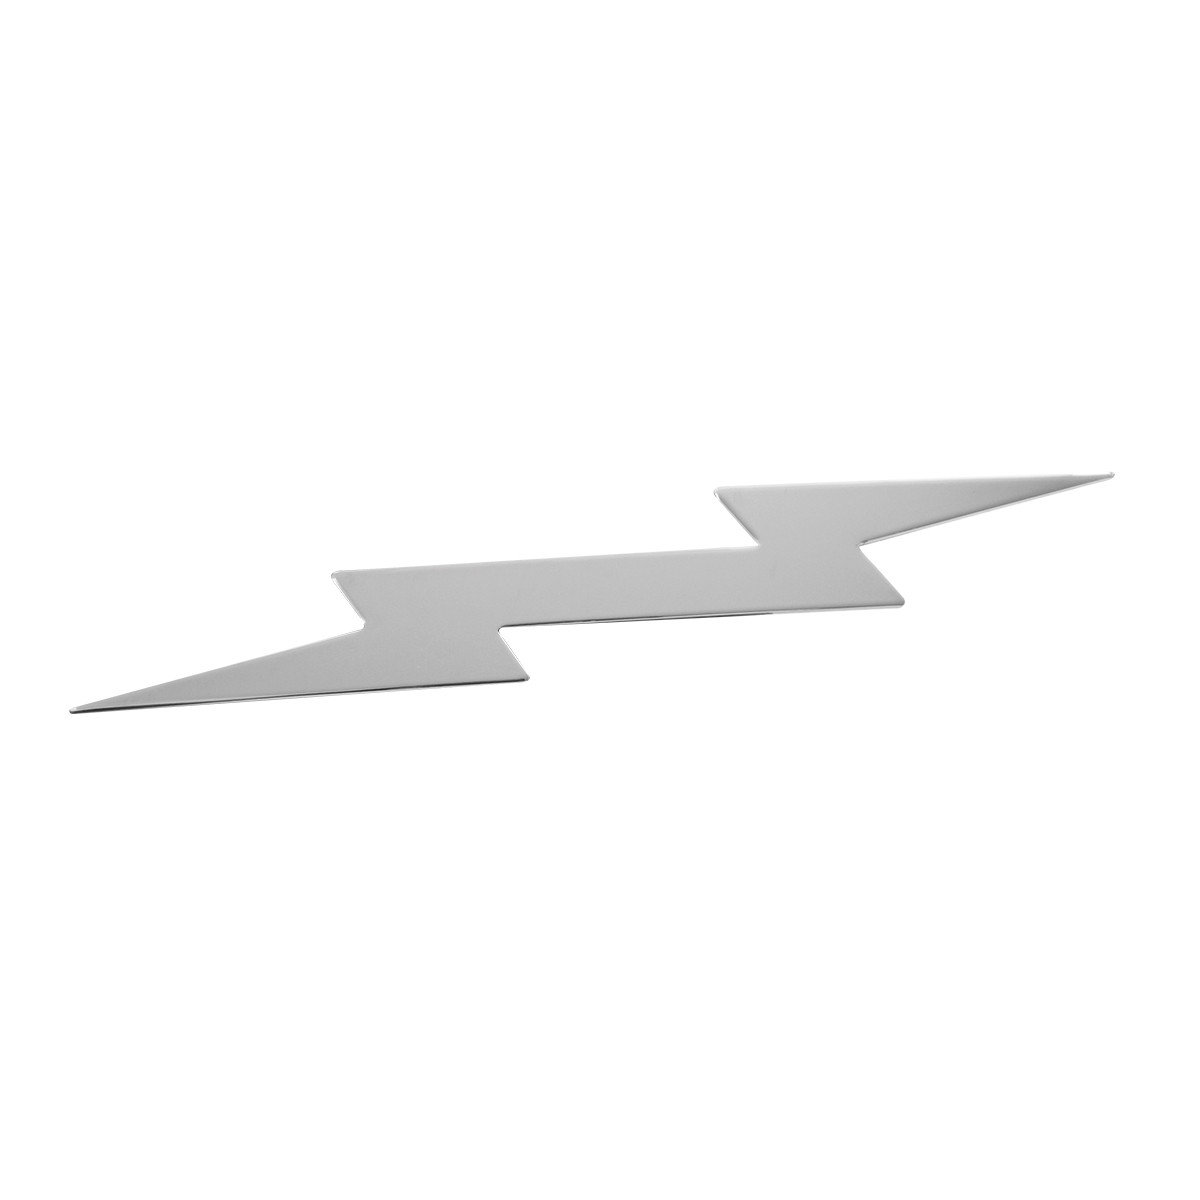 Chrome Plated Steel Lightning Bolt Cut Out